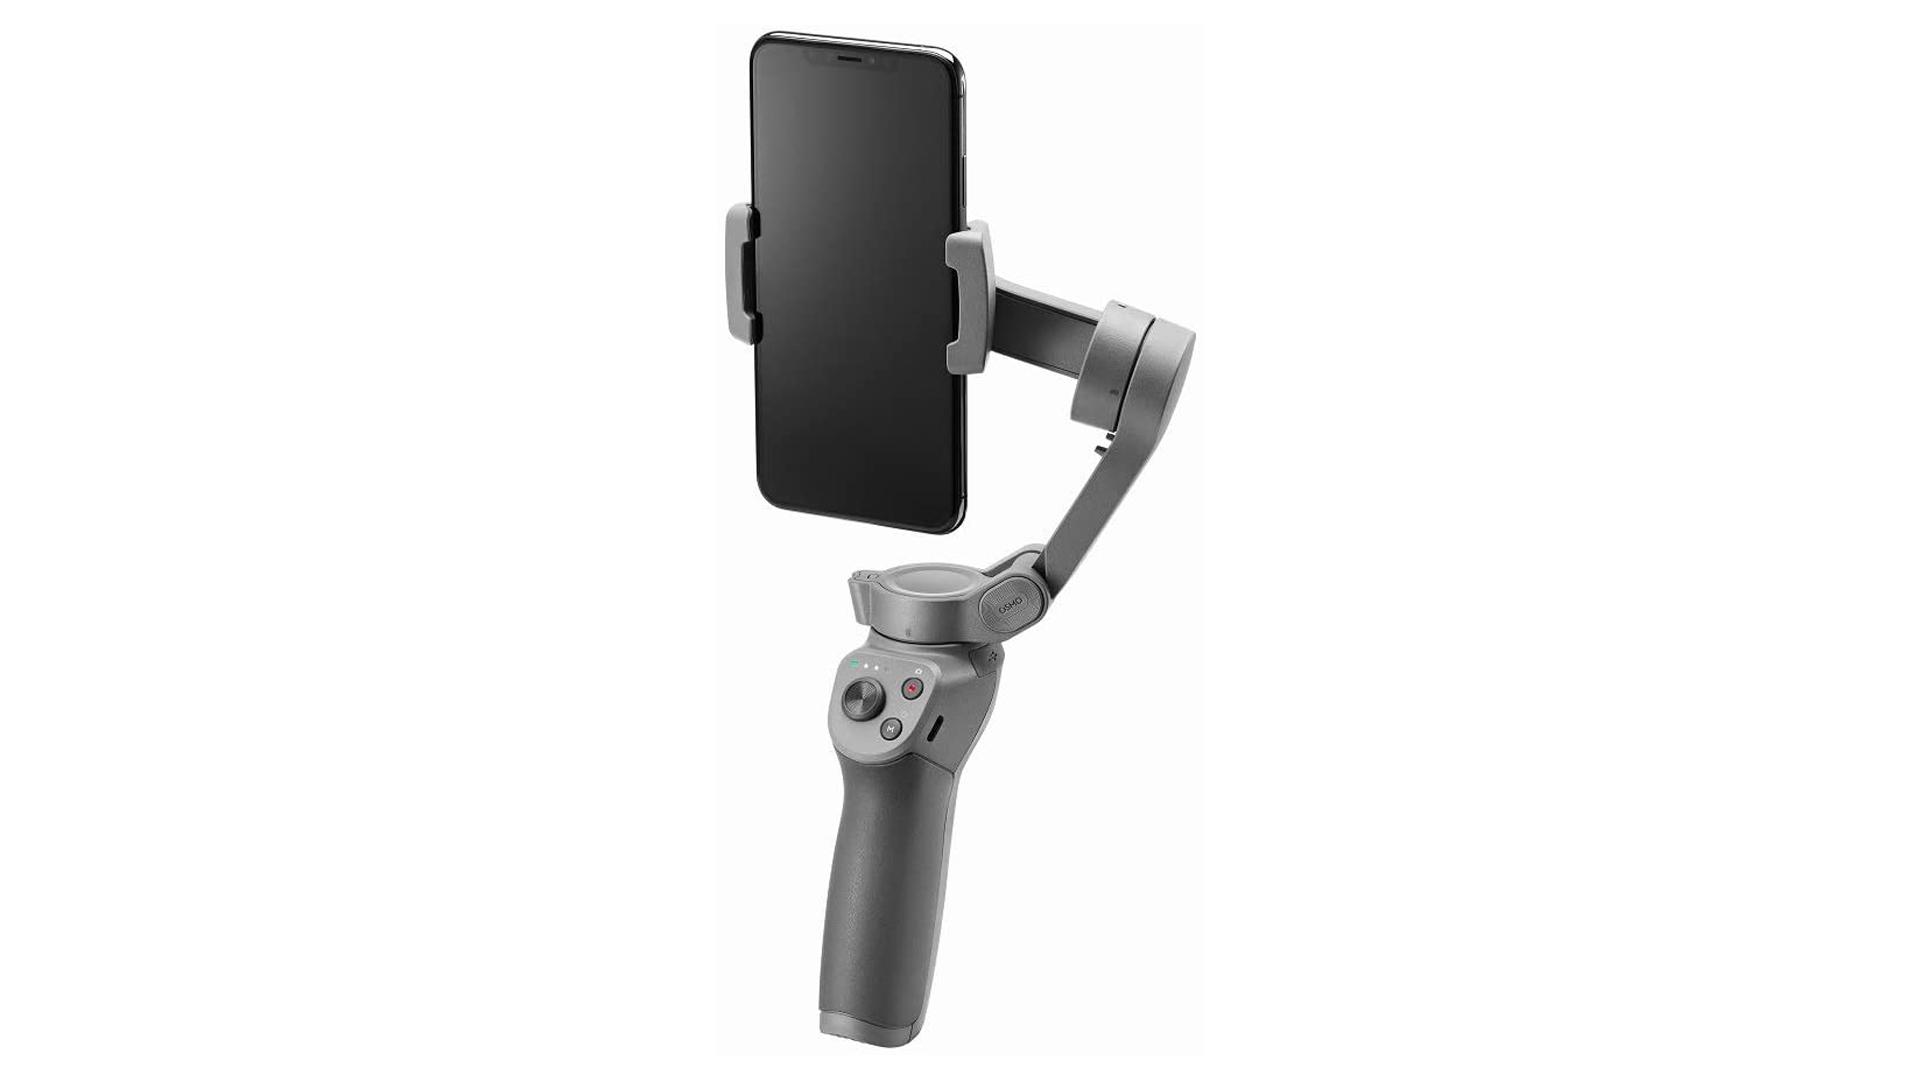 Le stabilisateur pour smartphone DJI Osmo Mobile 3 à 80 euros